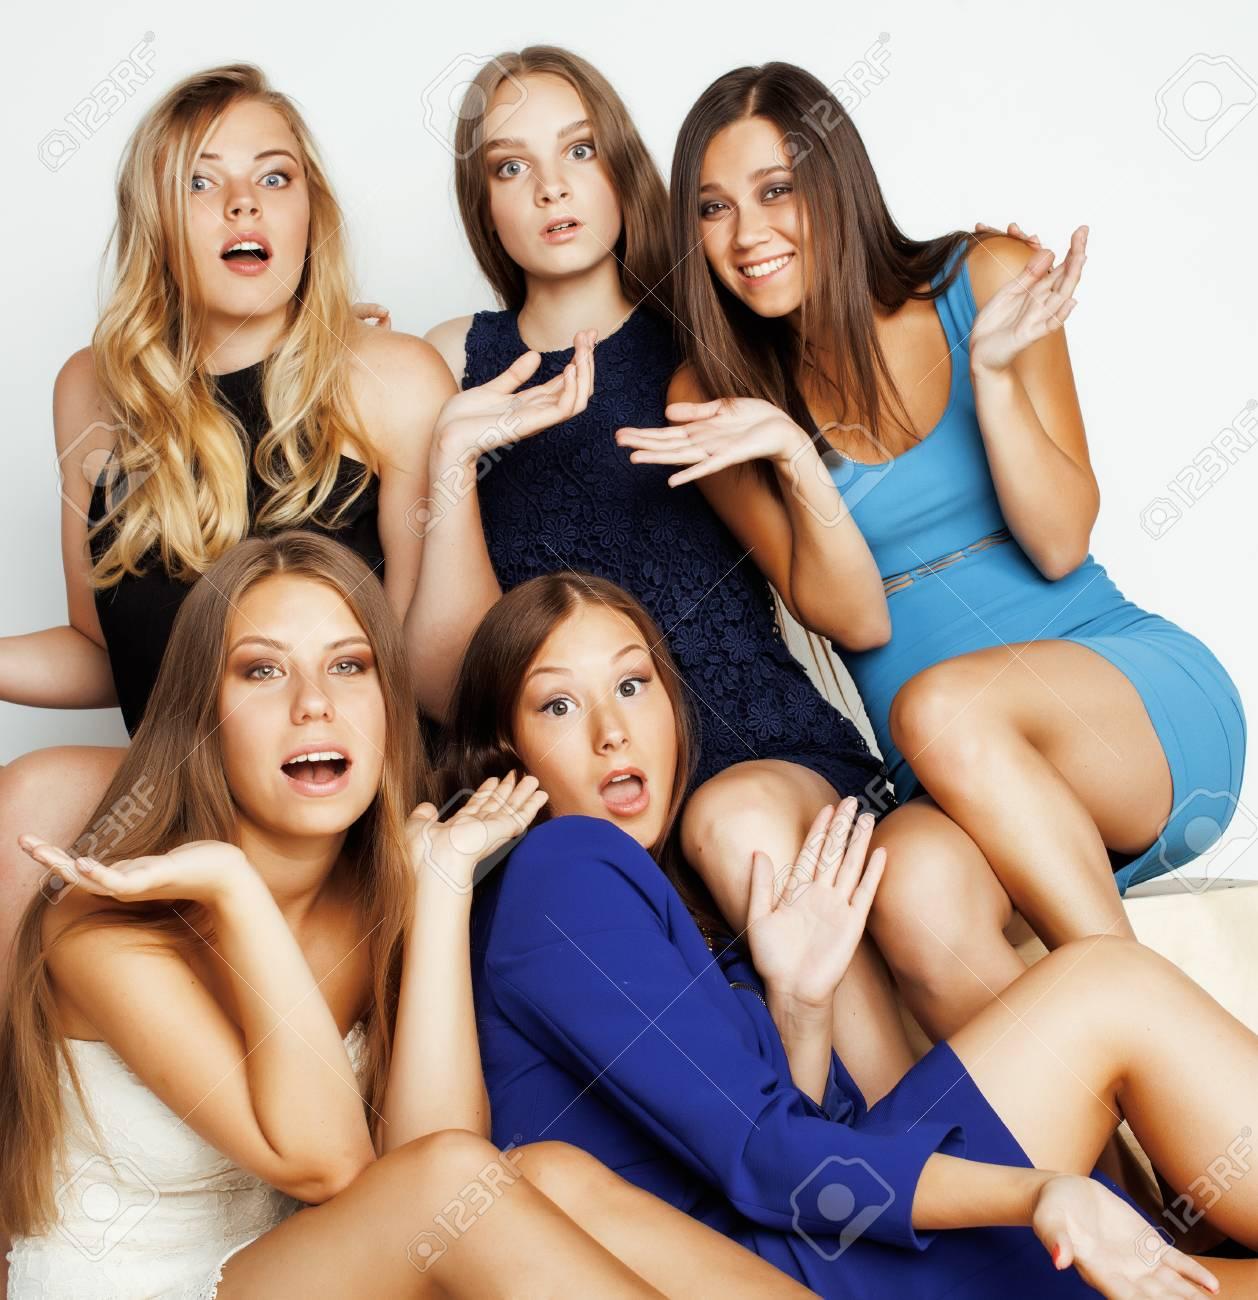 Free Lesbian Pussy Videos